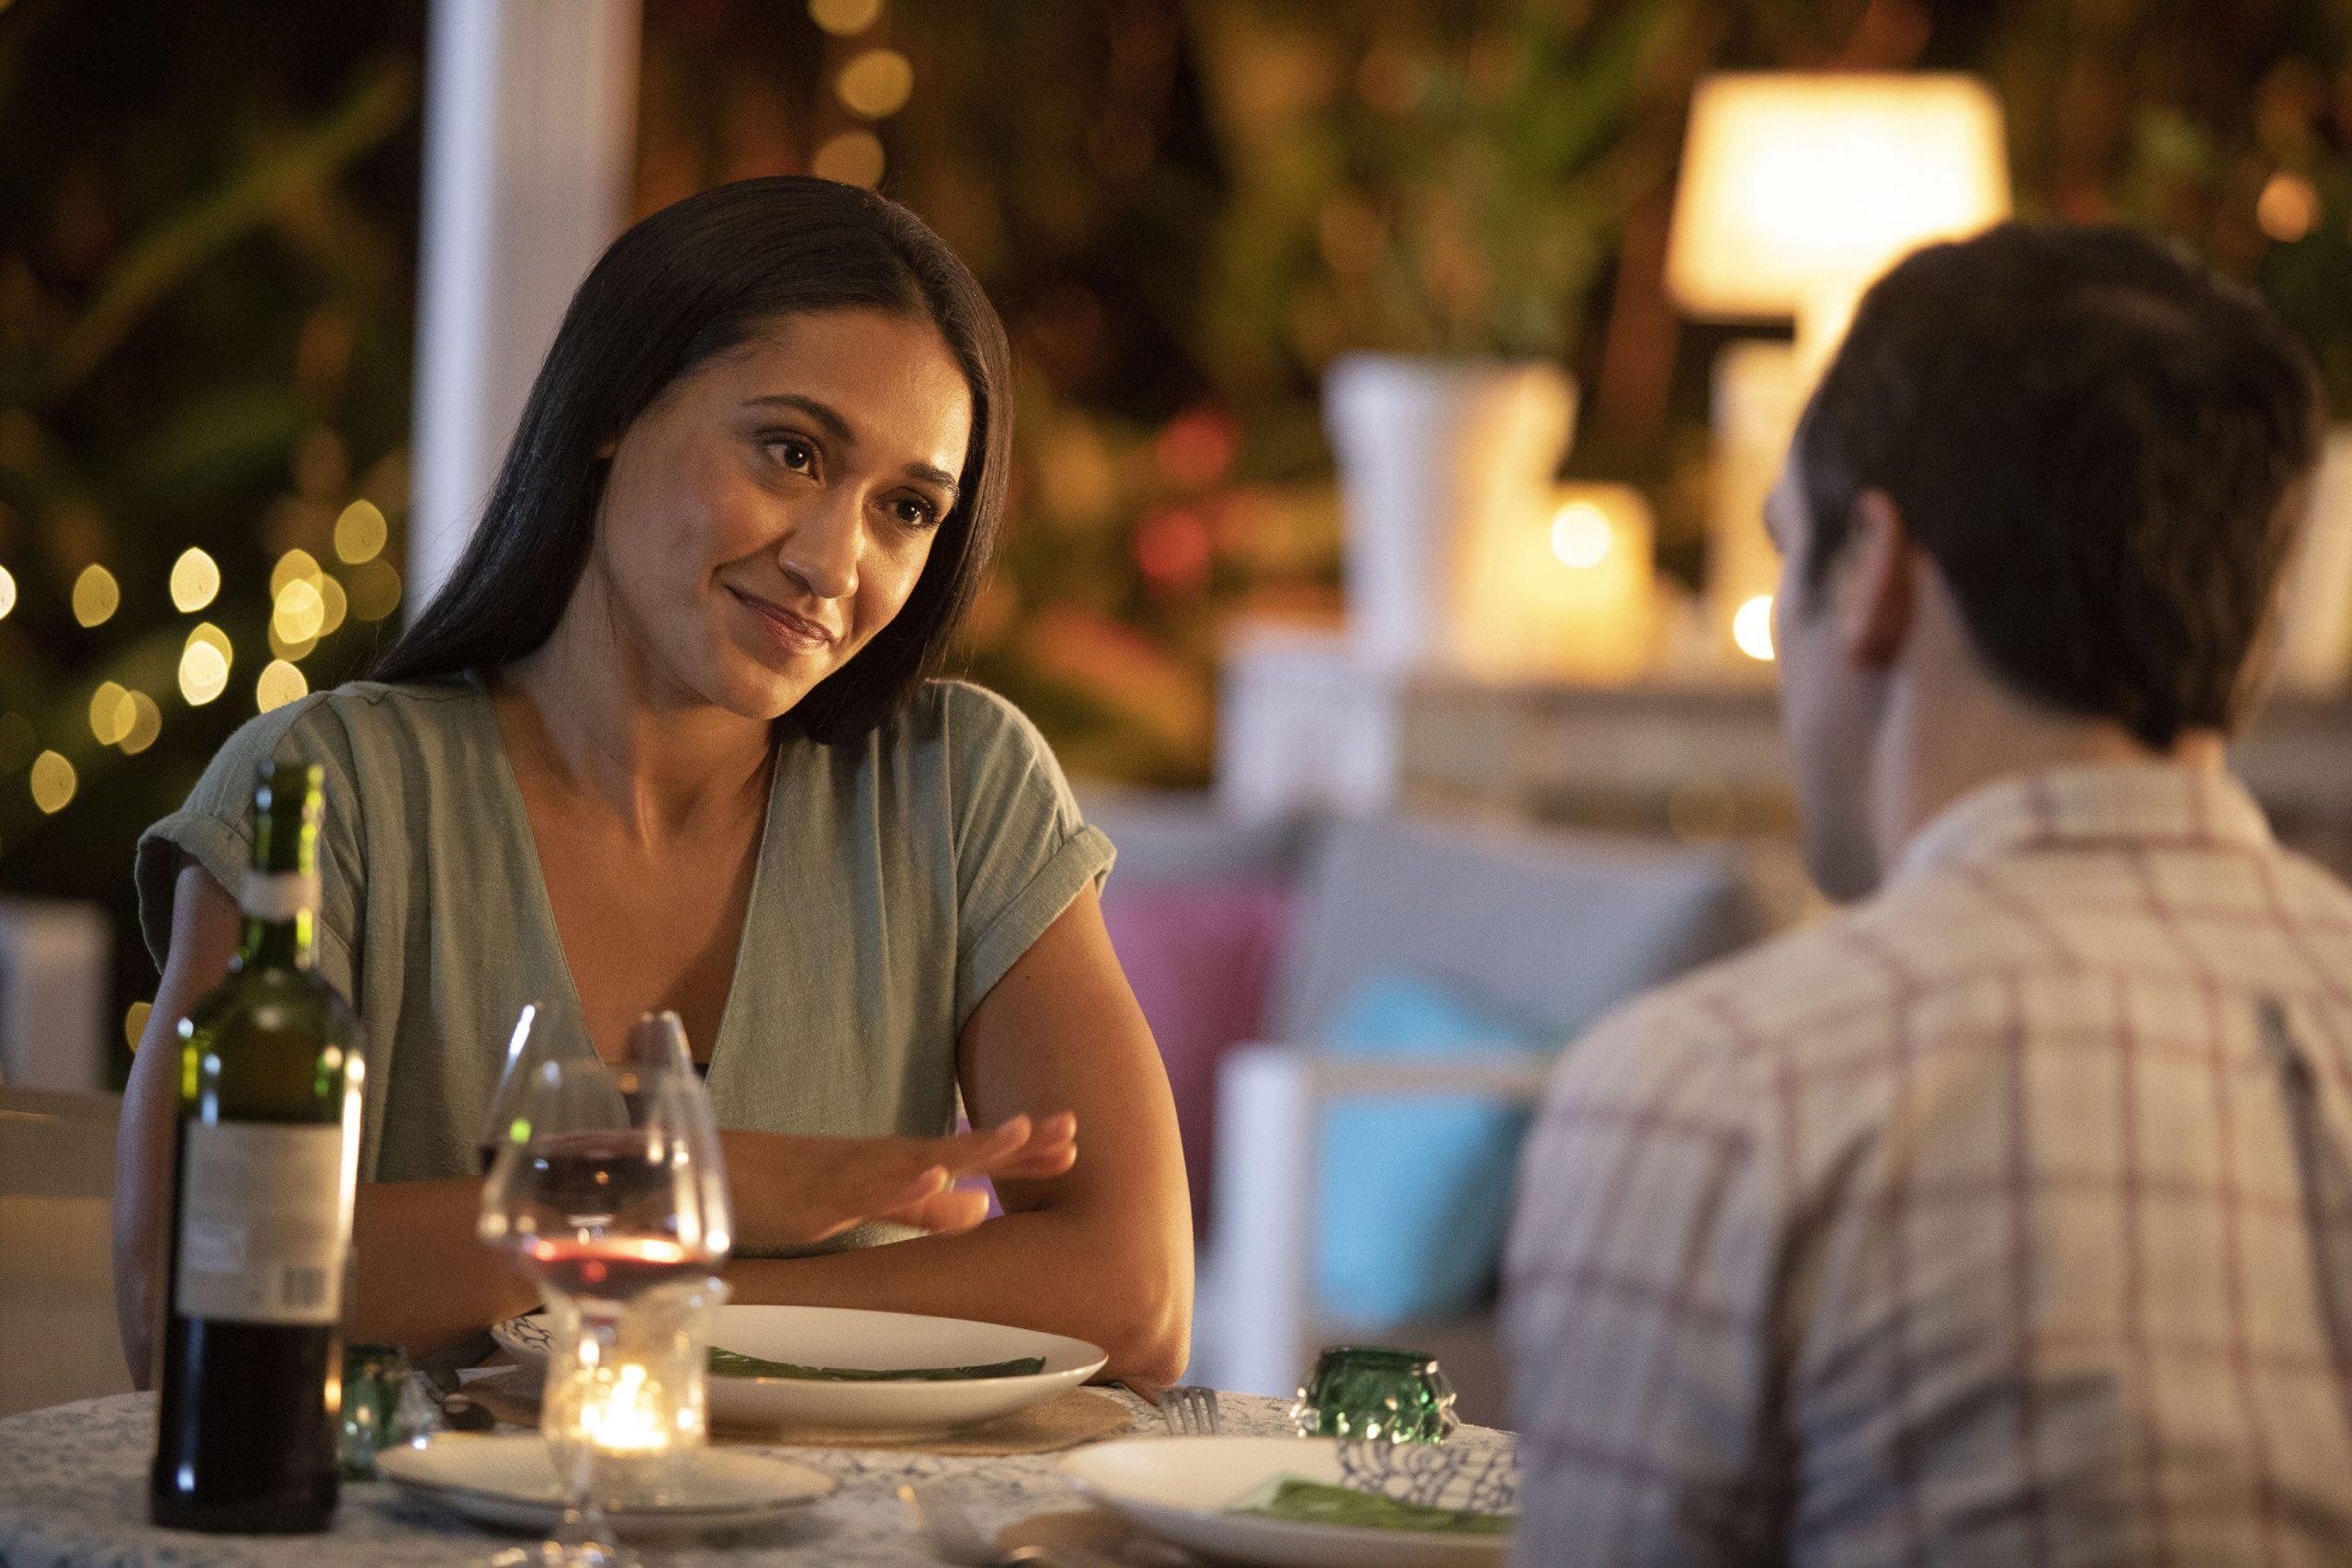 DS Florence Cassell y DI Neville Parker disfrutan de una cena juntos